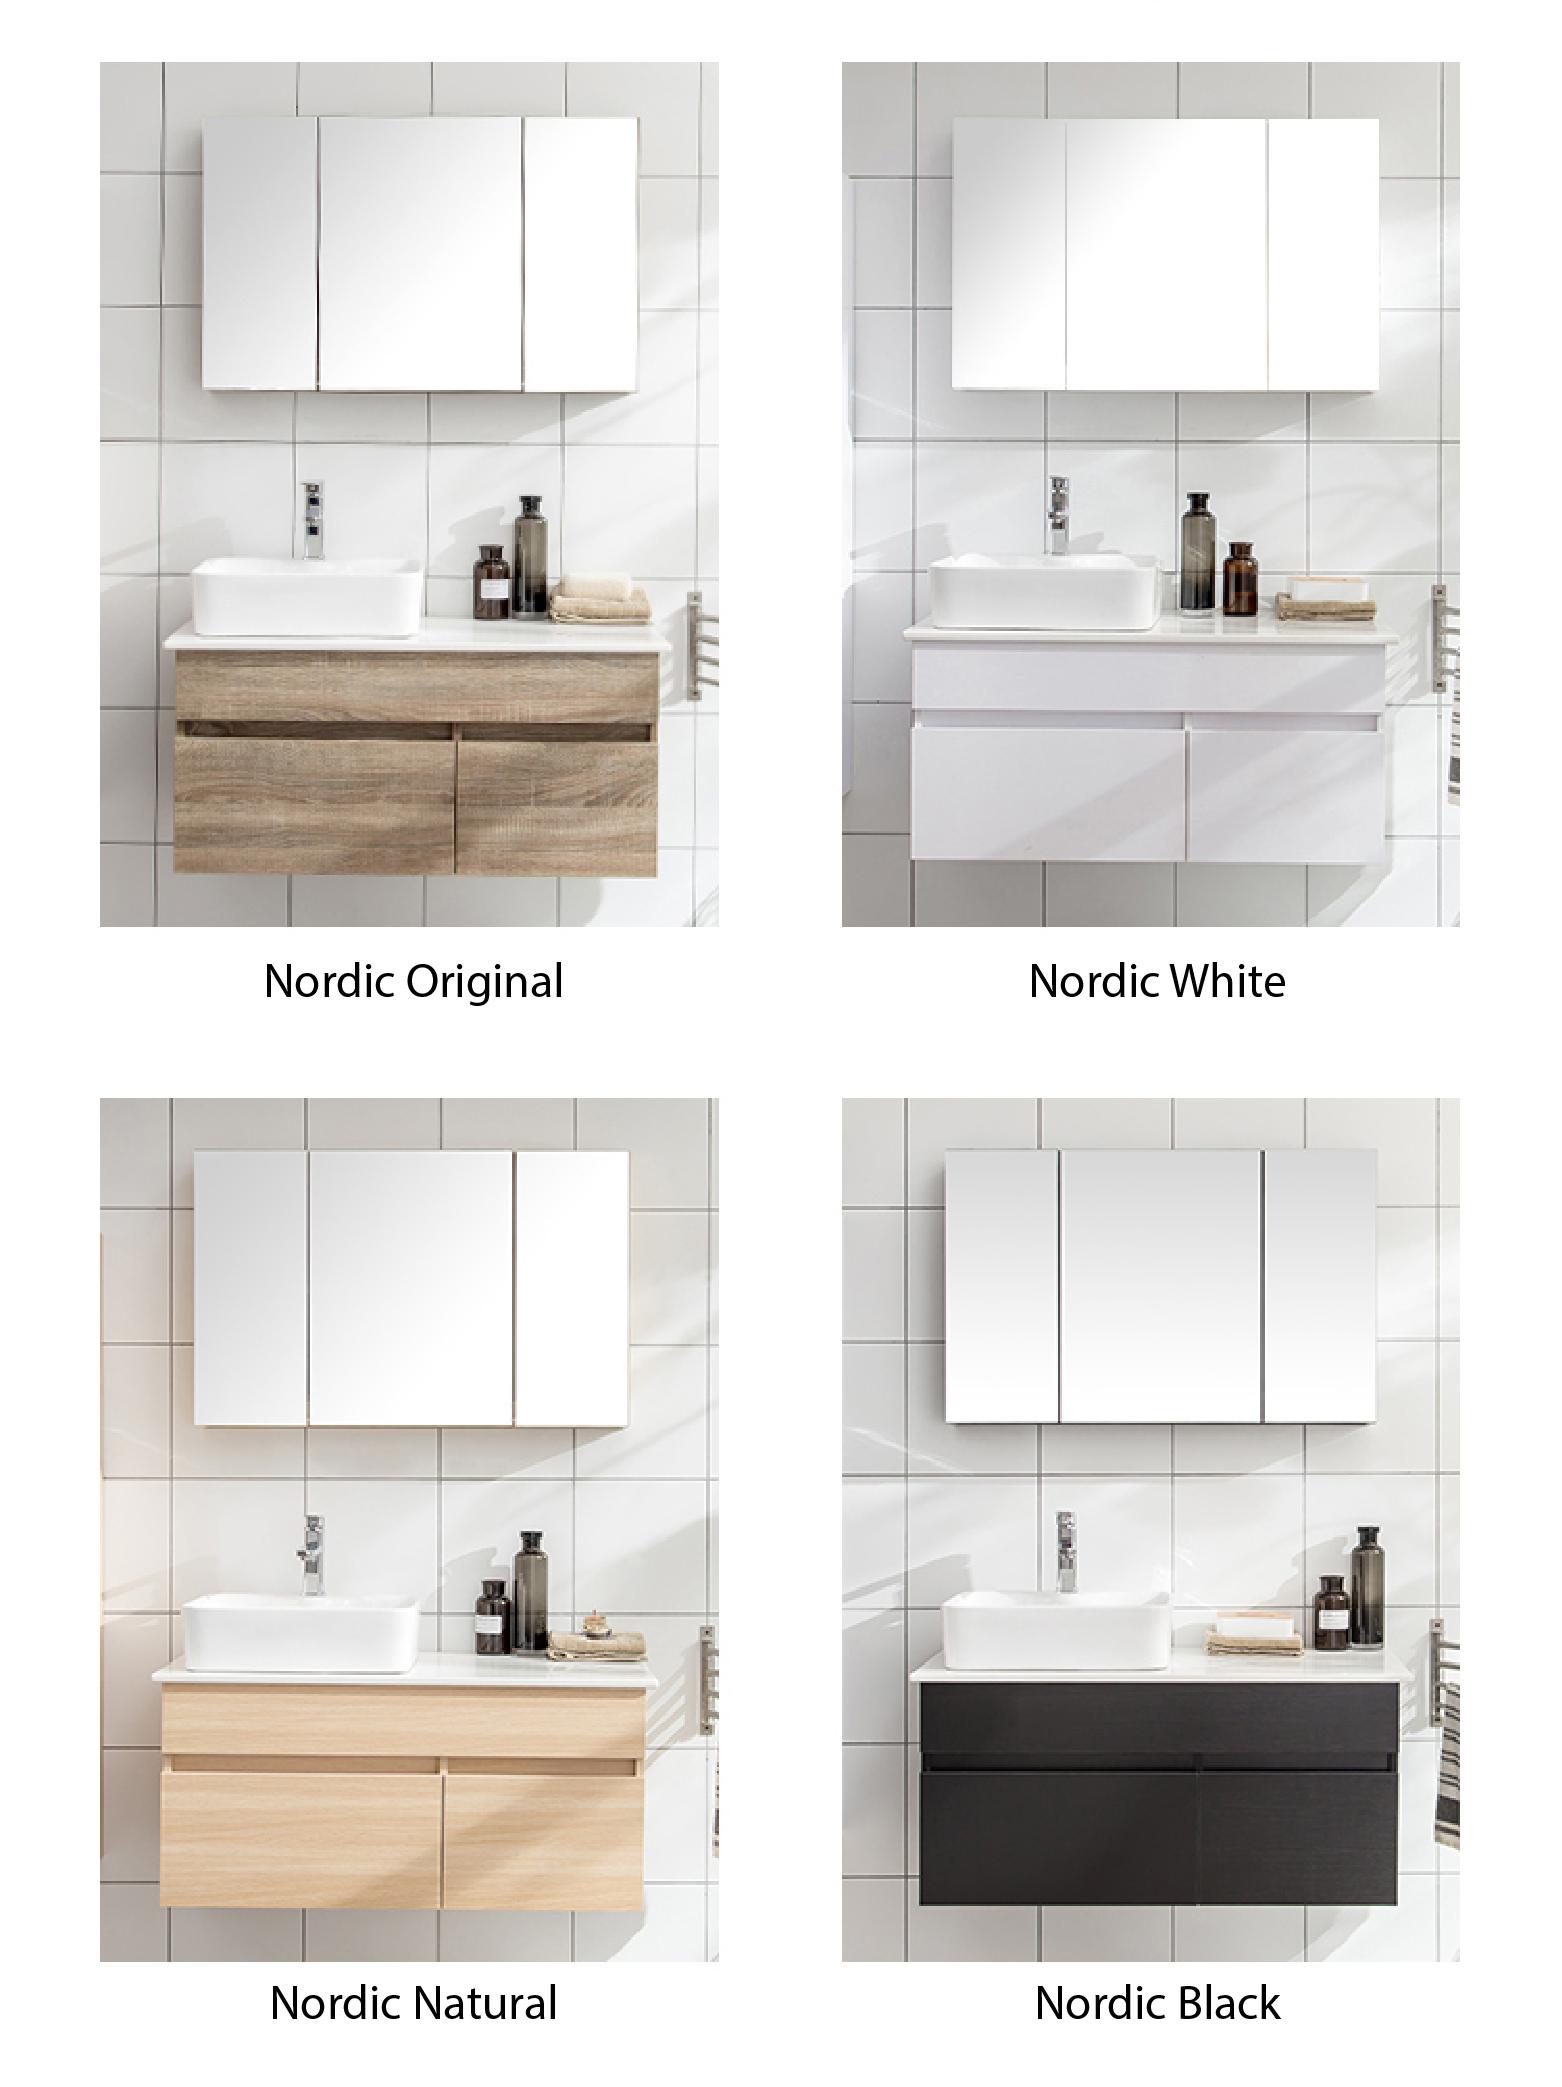 Bathroom Vanity Extended Over Toilet: Luxury Nordic Vanity Cabinet (Nordic Original)